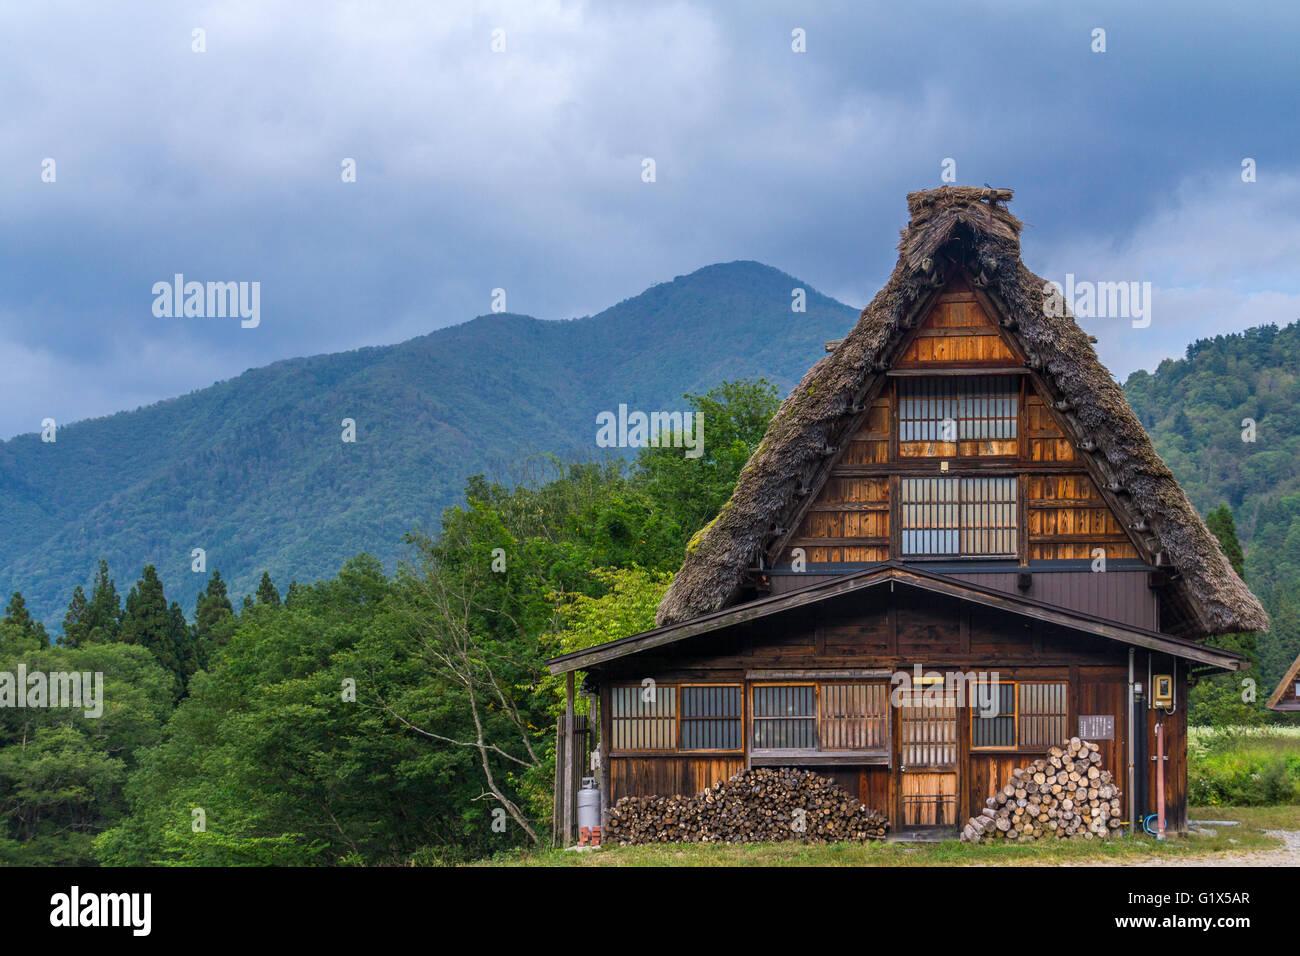 shirakawa-go village japan - Stock Image